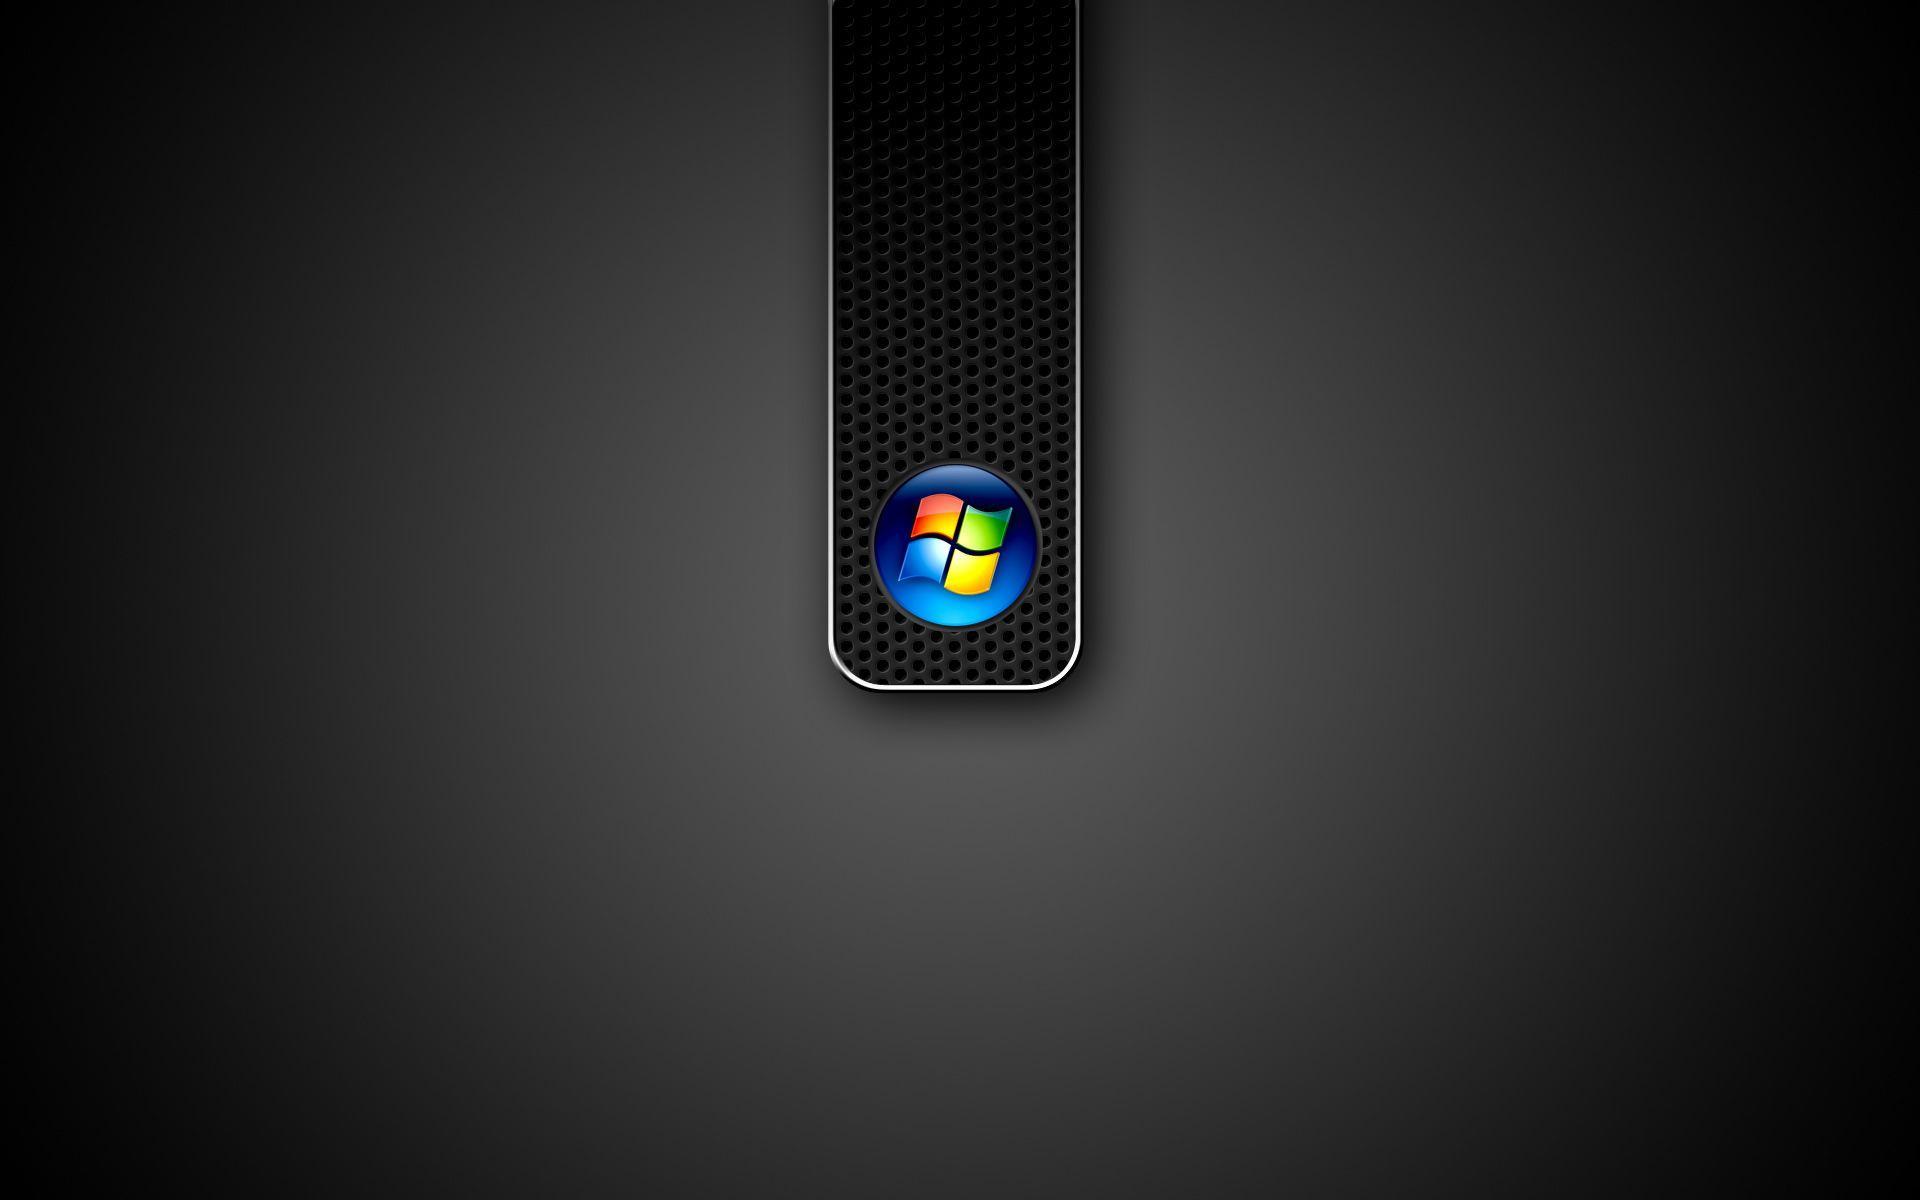 Hd wallpaper windows 7 - Windows Wallpapers Full Hd Wallpaper Search Page 10